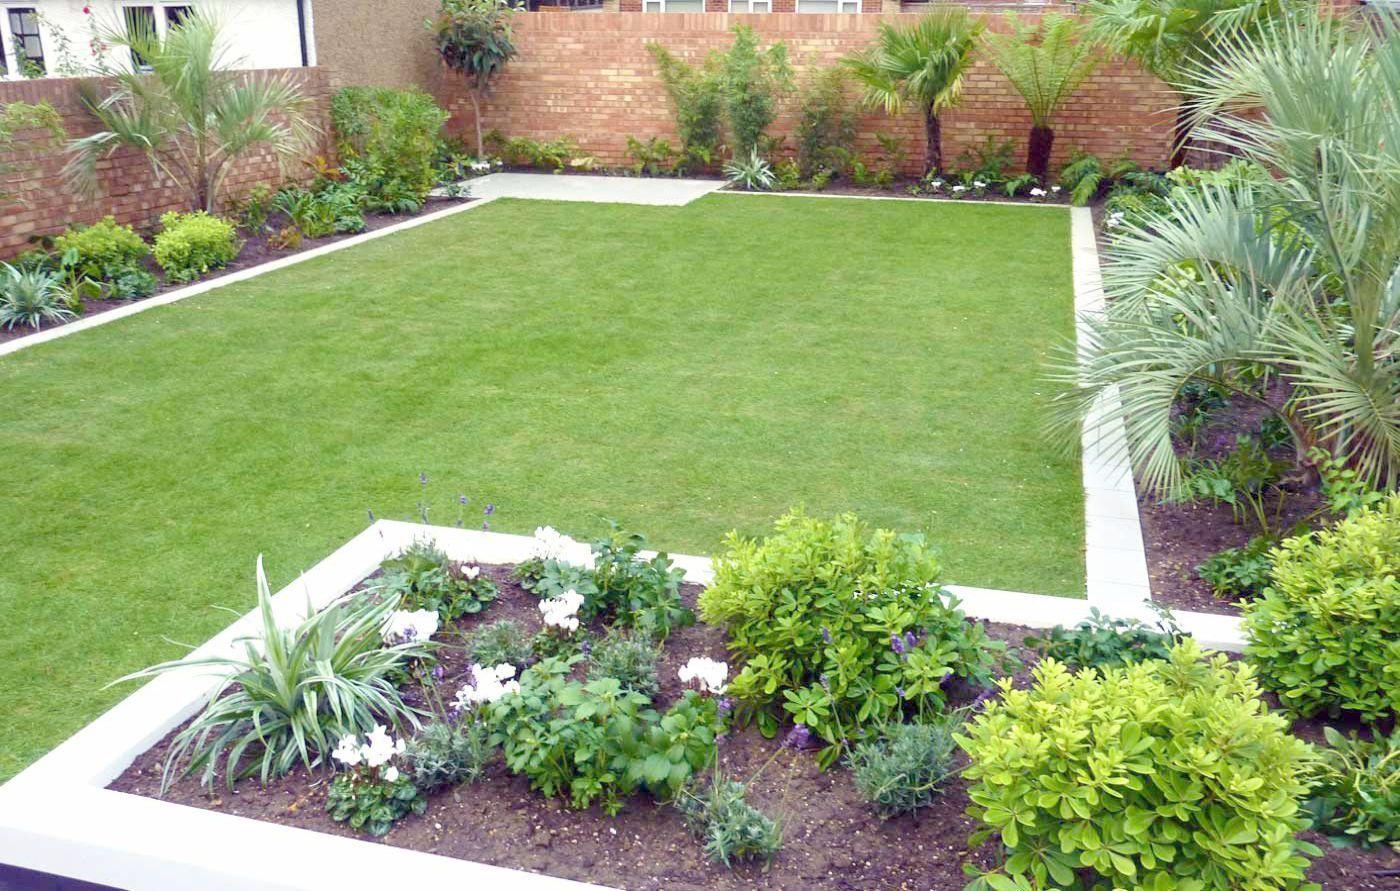 Landscape Design For Hilly Backyard Per Landscape Gardening Apprenticeship Wages Simple Garden Designs Garden Landscape Design Garden Design Layout